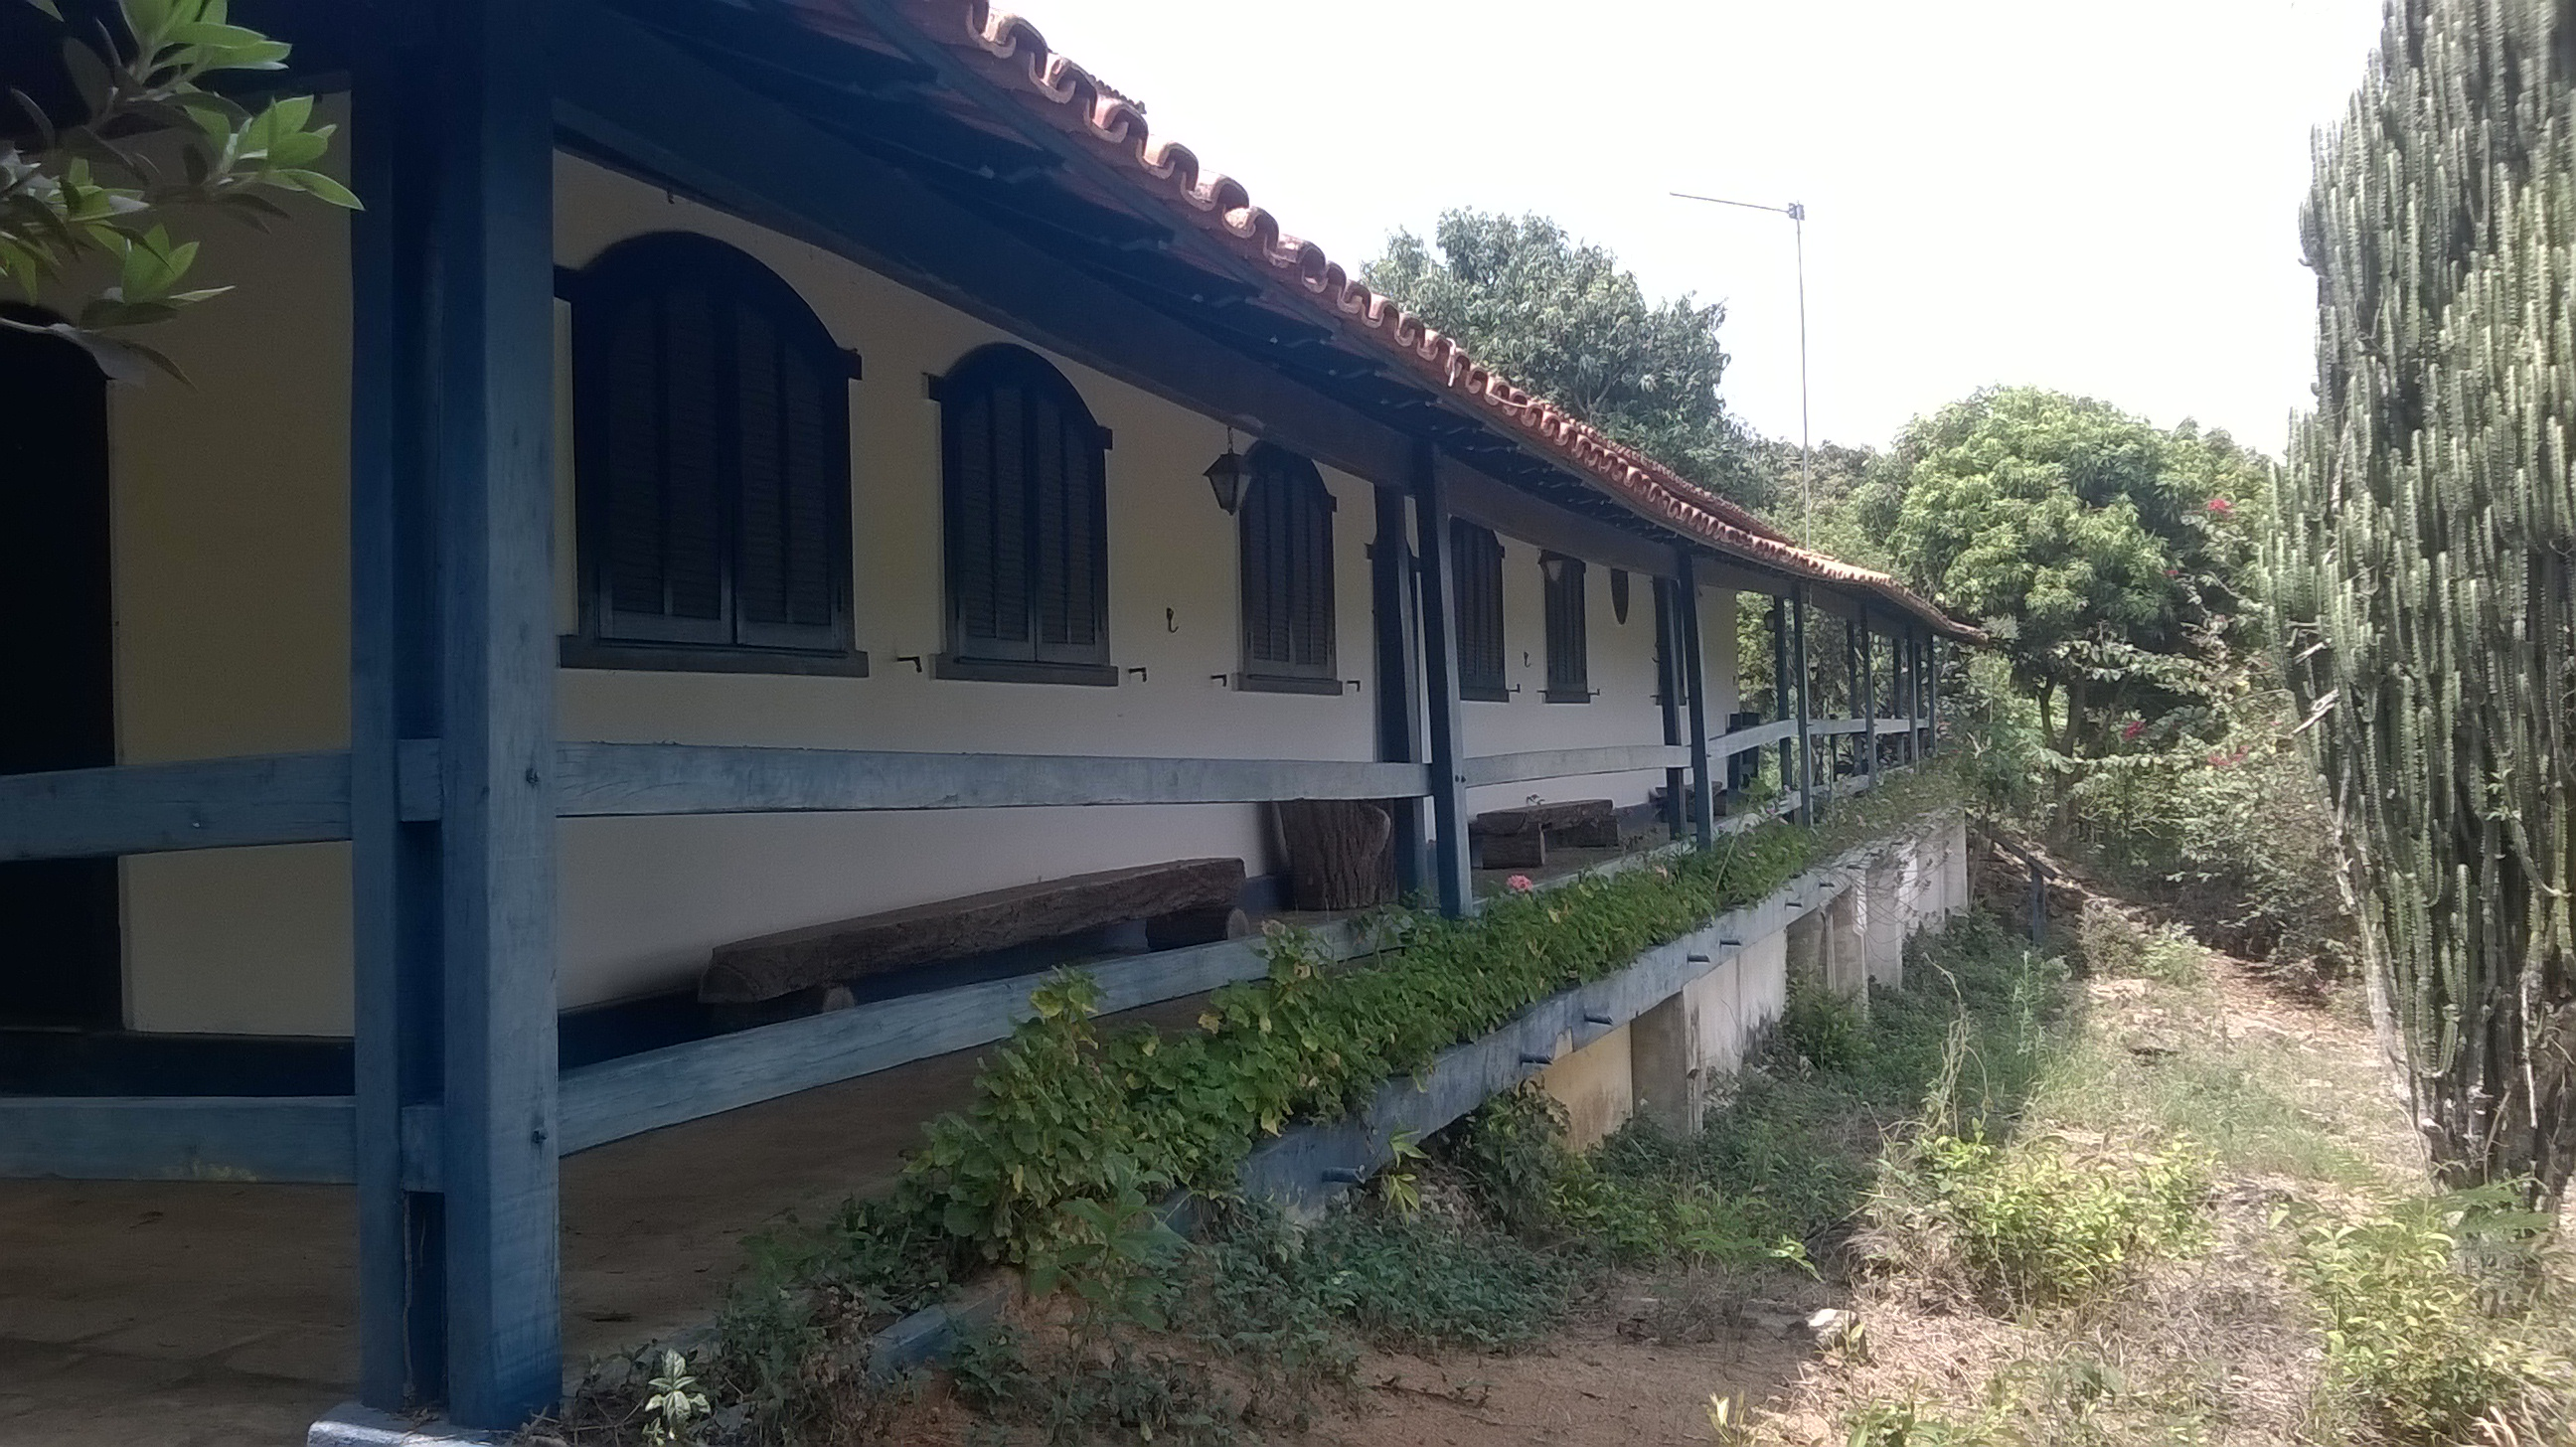 Fazenda Em Santo Antonio Do Monte Ofertas Pastar -> Planta De Sala De Ordenha